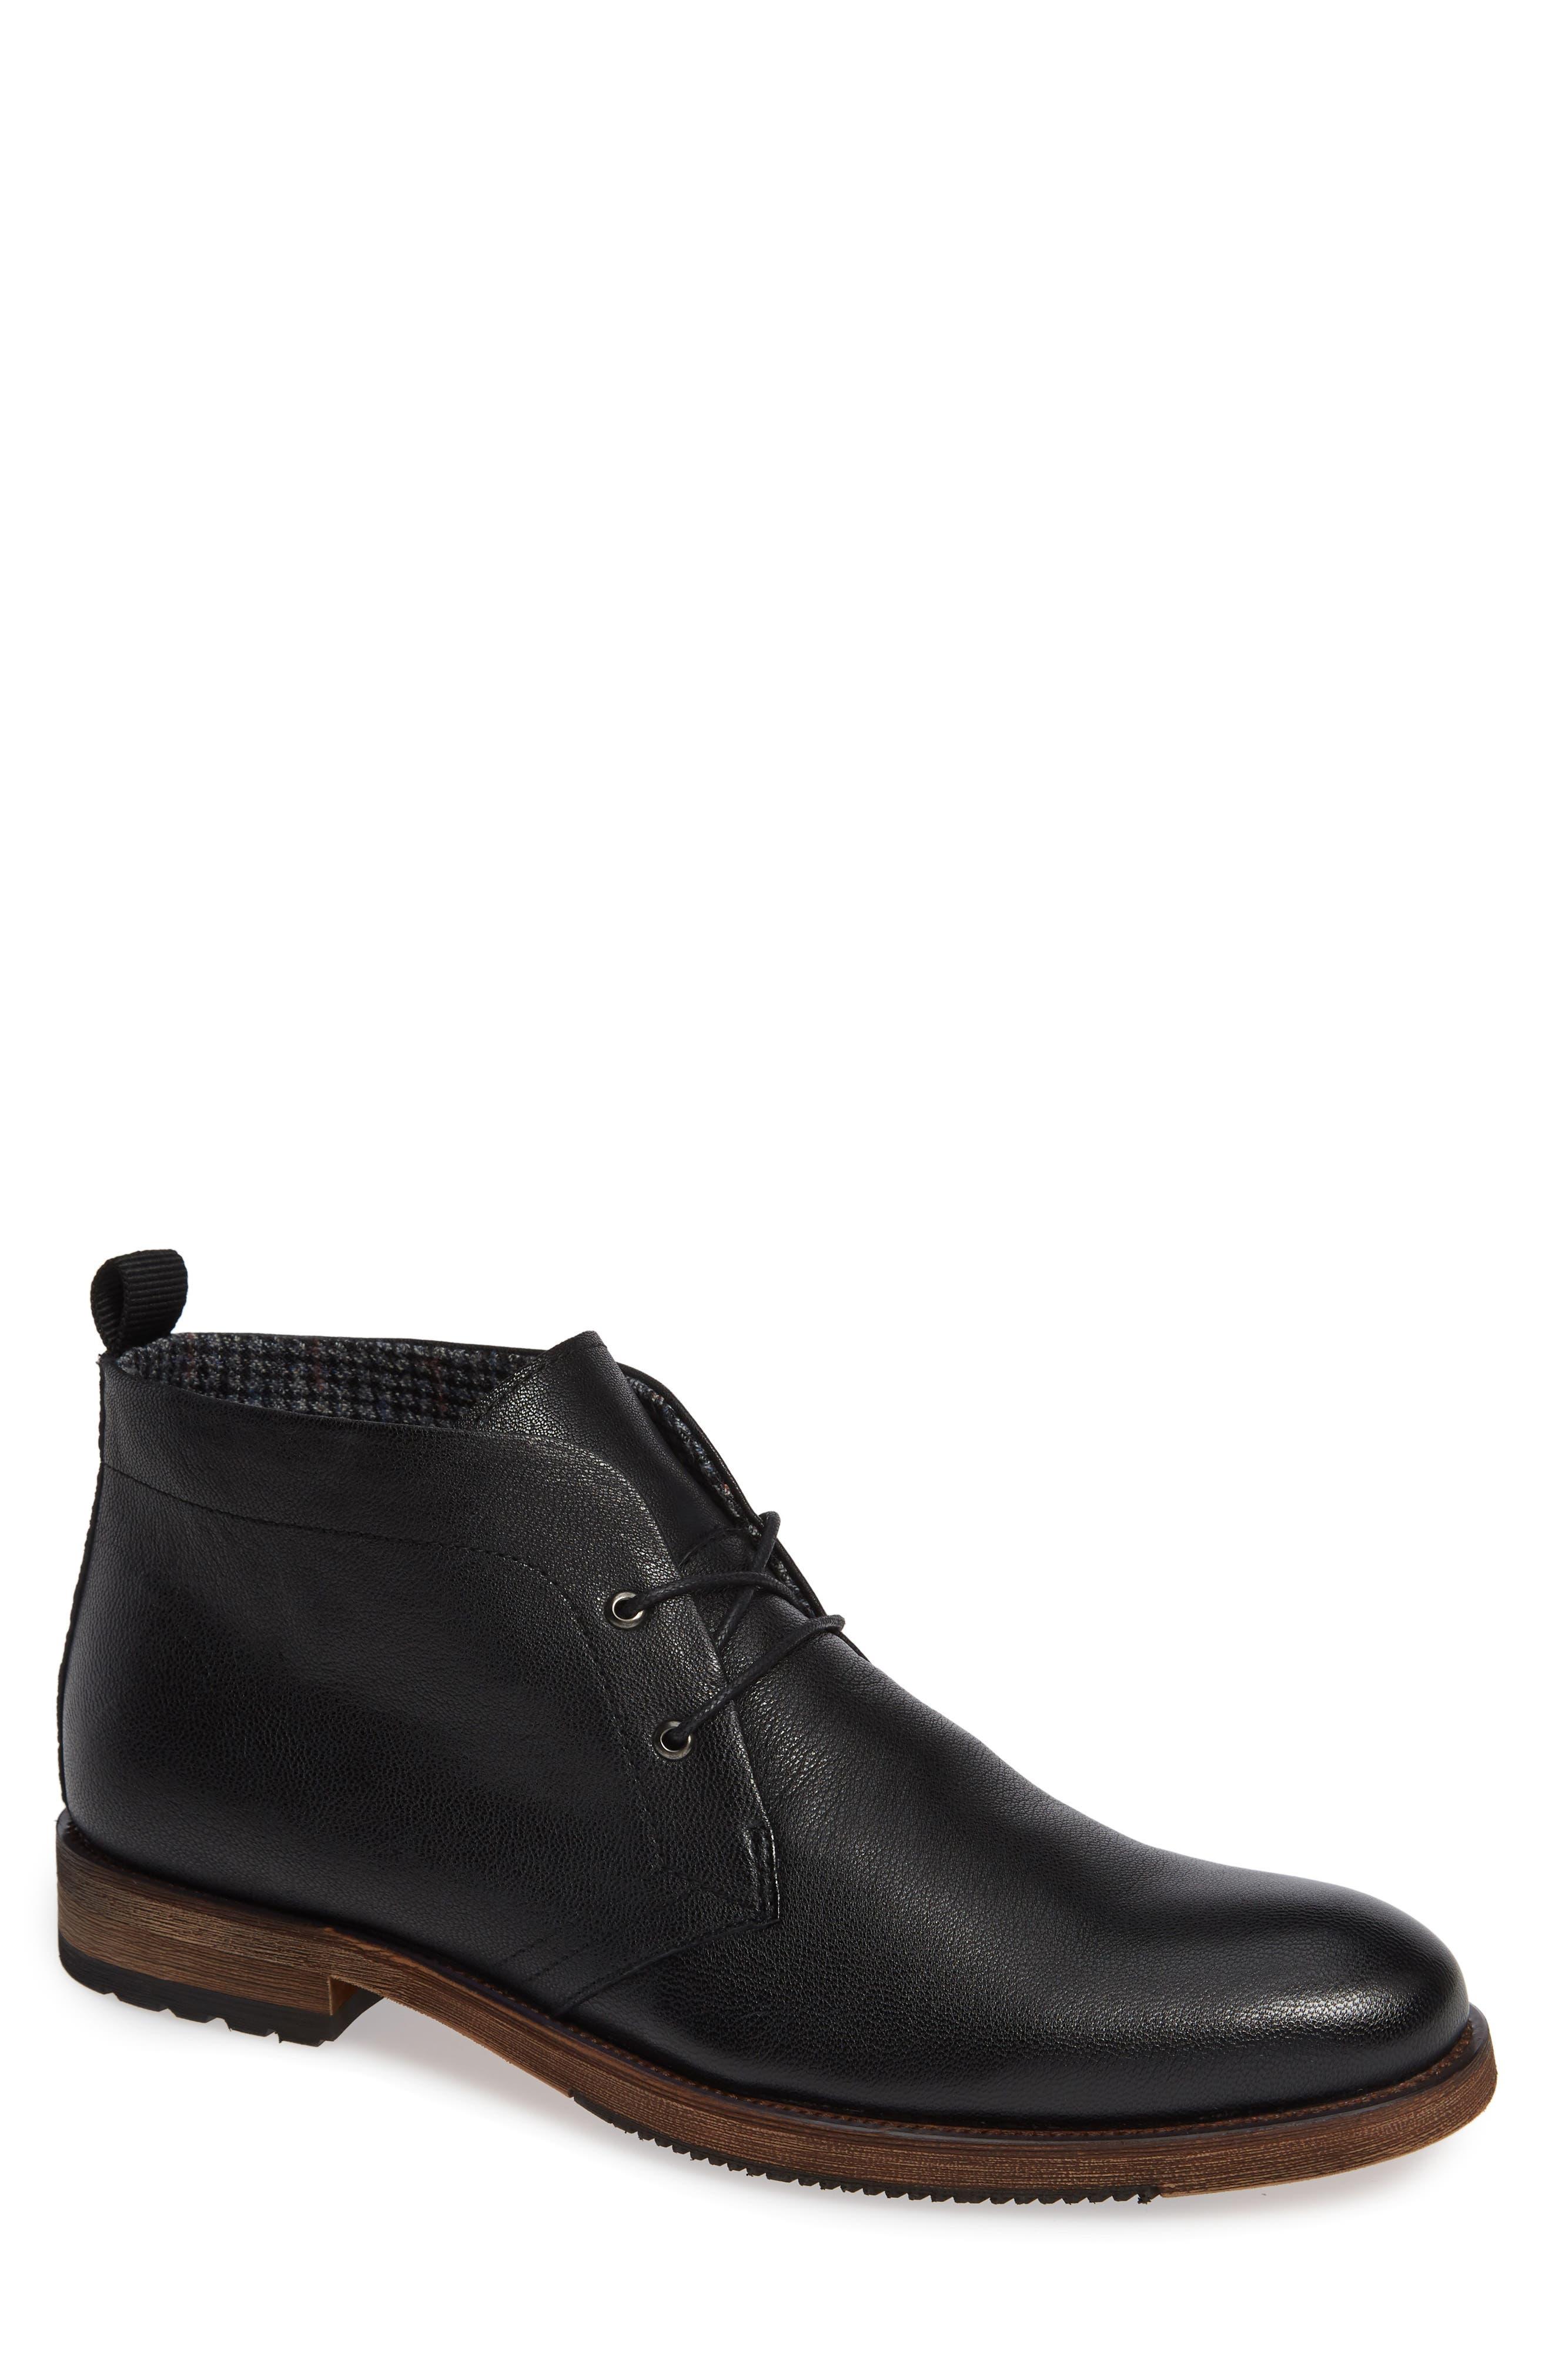 Sheffield Chukka Boot,                         Main,                         color, BLACK